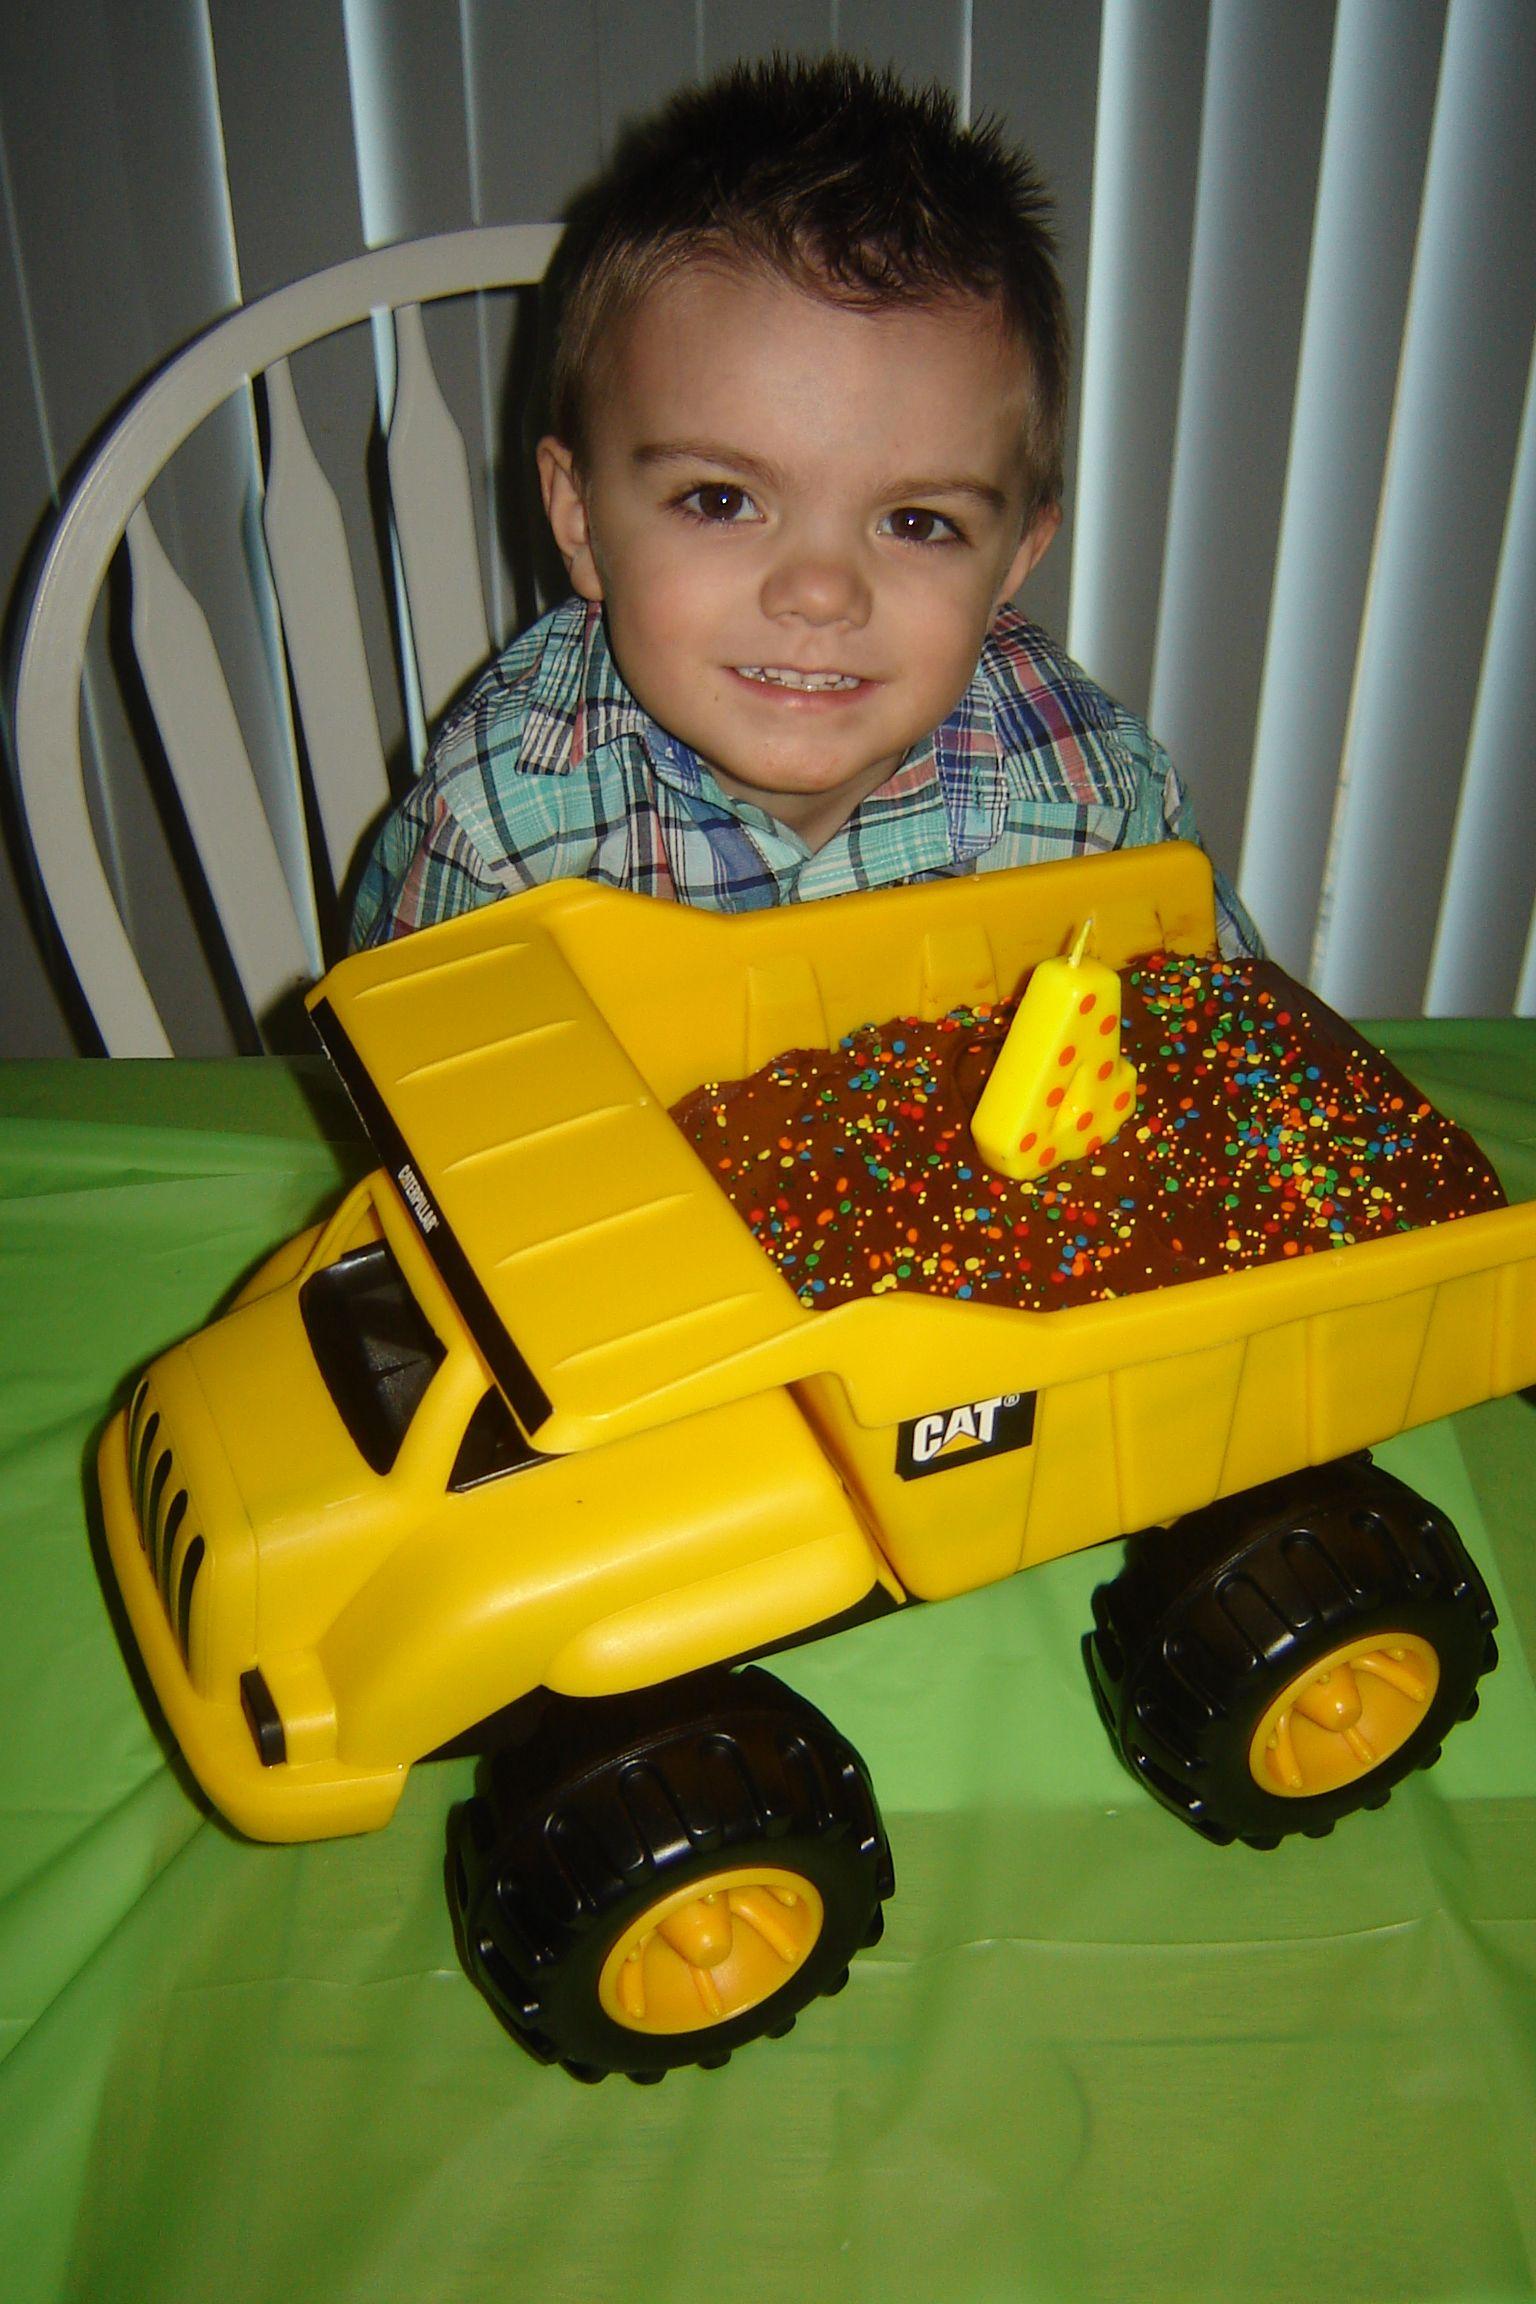 Dump truck birthday cake So fun for a little boys birthday party